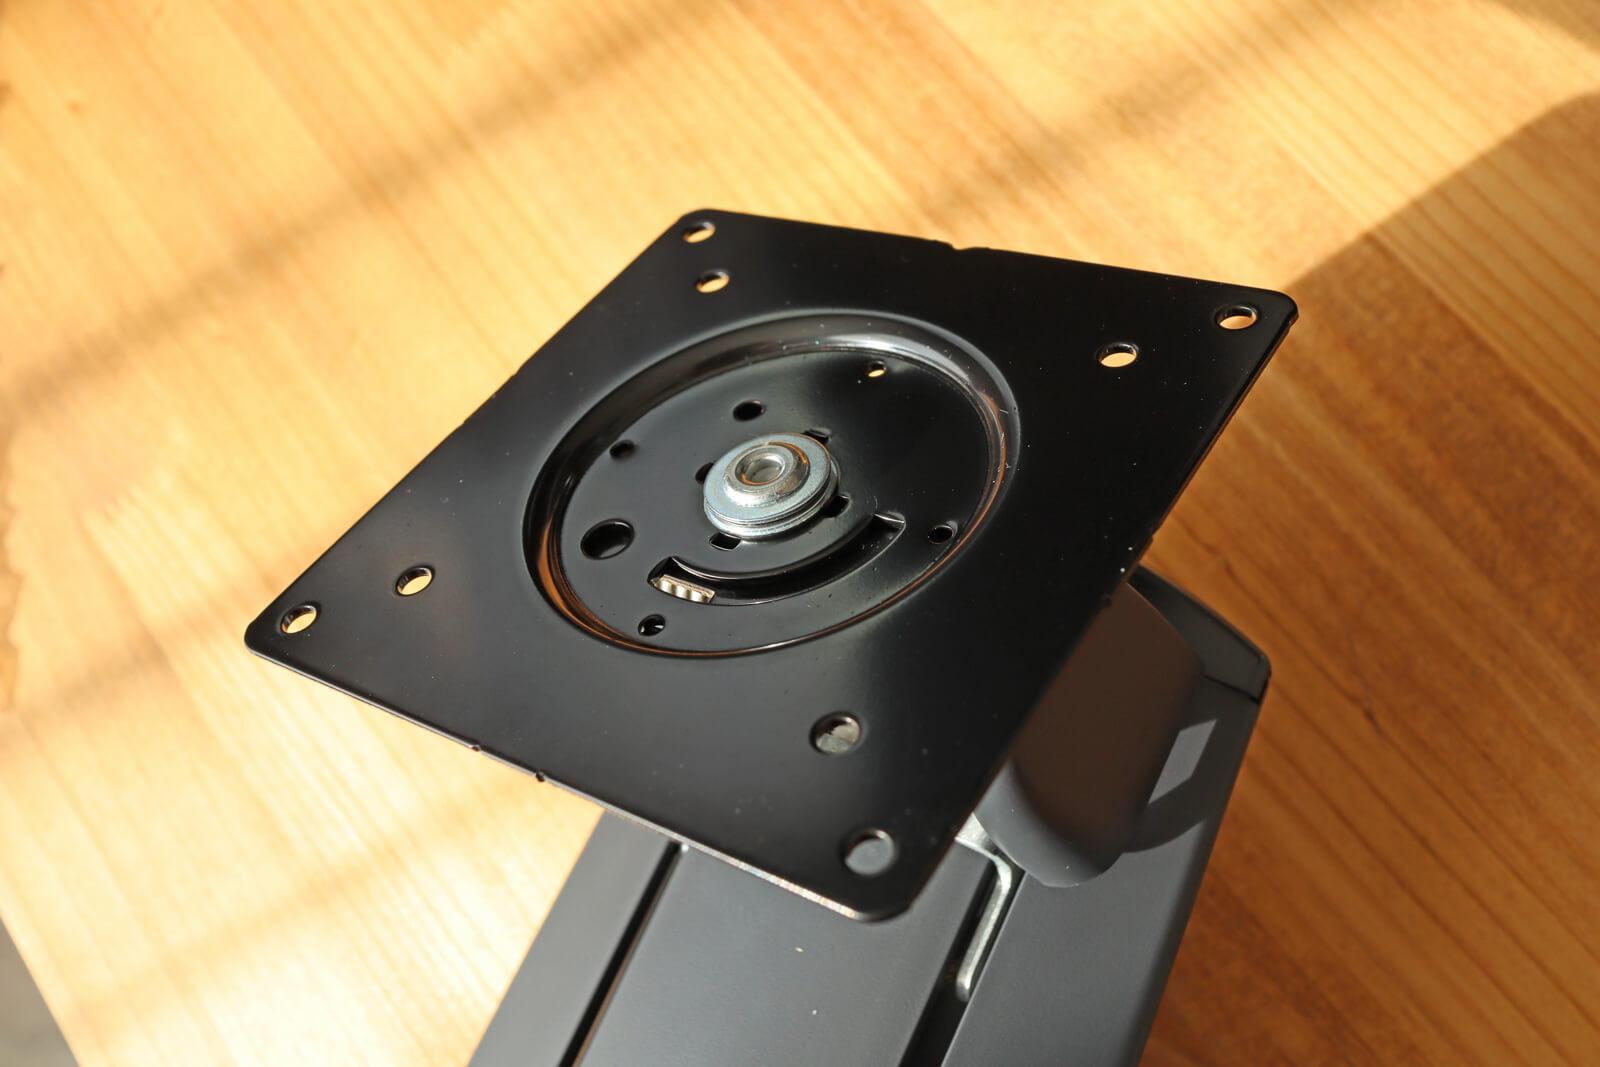 VESA規格は75mmと100mmに対応